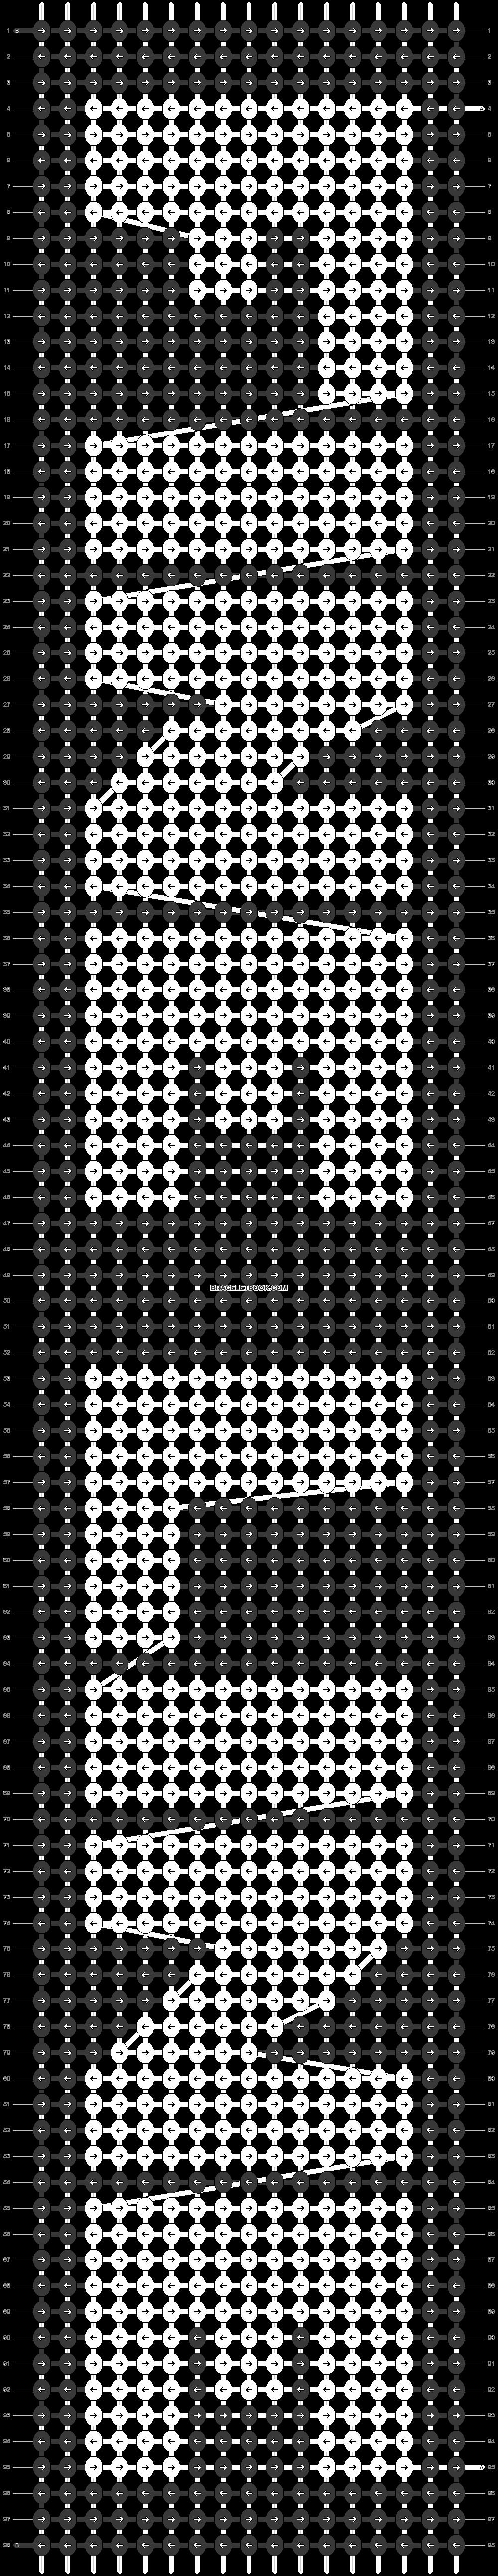 Alpha pattern #29780 pattern